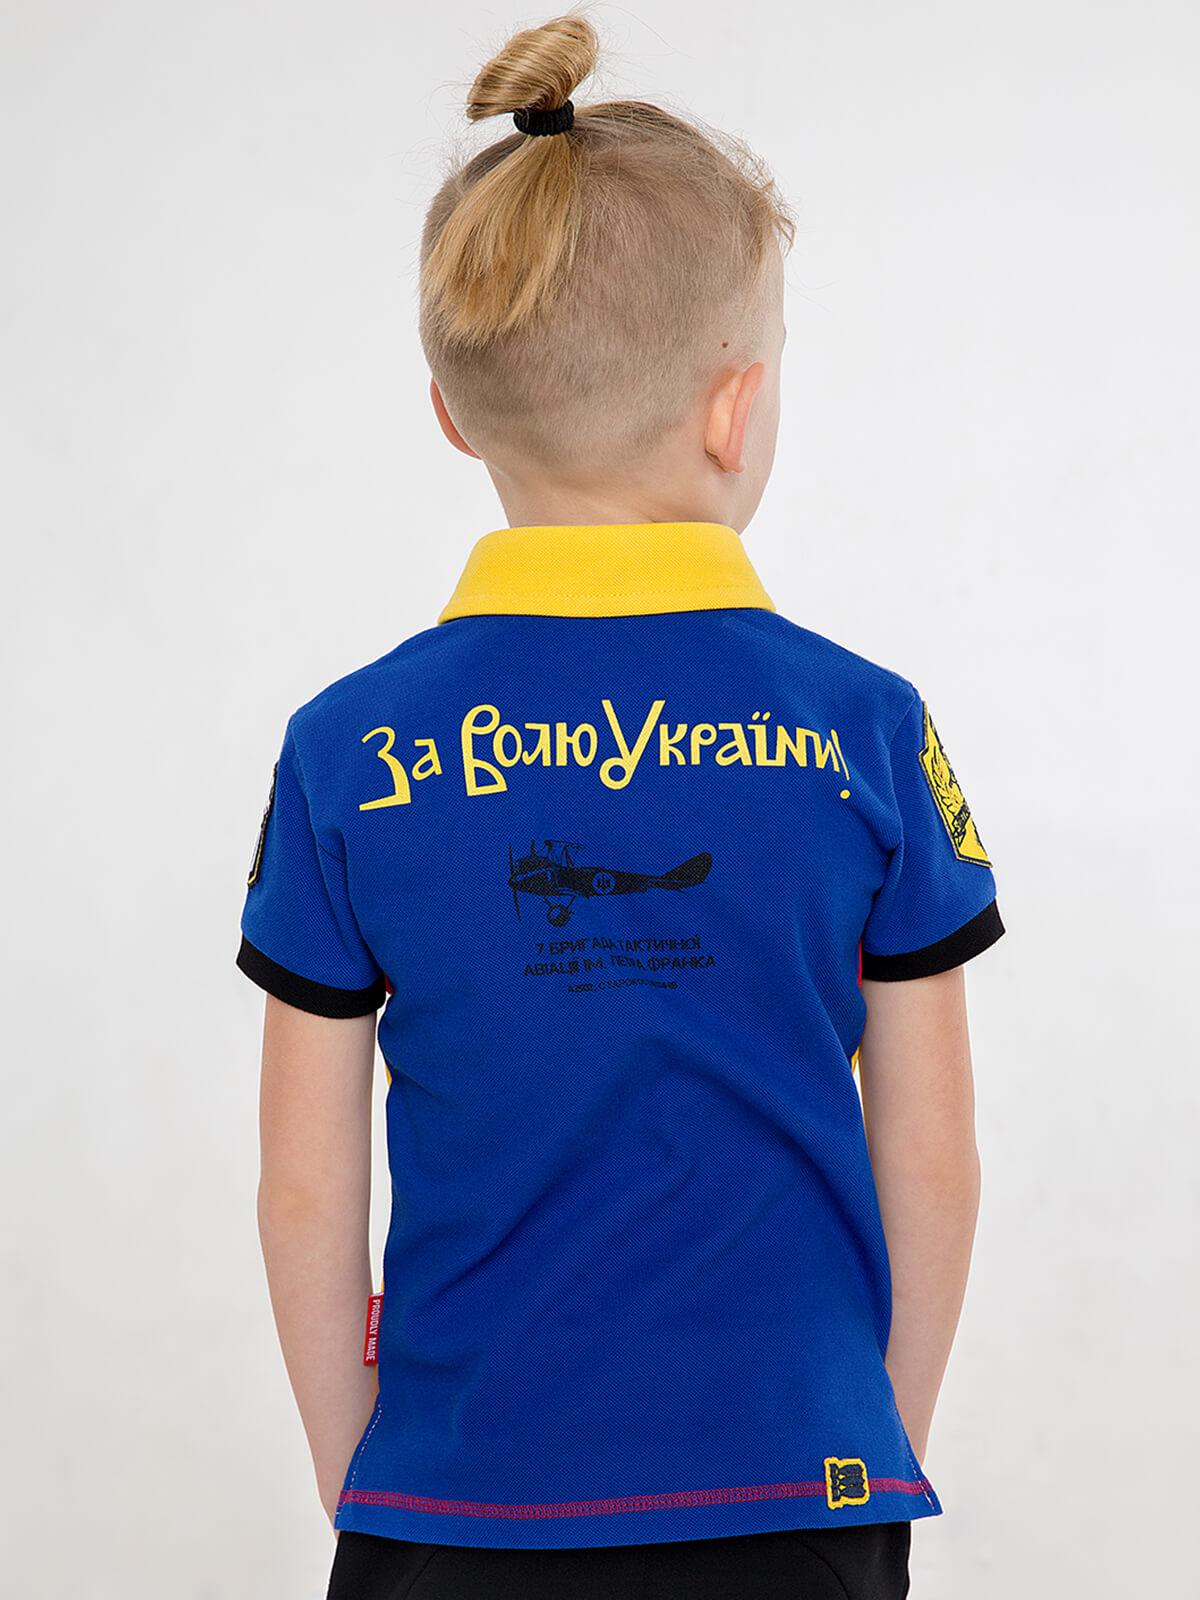 Kids Polo Shirt 7 Brigade (Petro Franko). Color navy blue.  Technique of prints applied: embroidery, silkscreen printing.